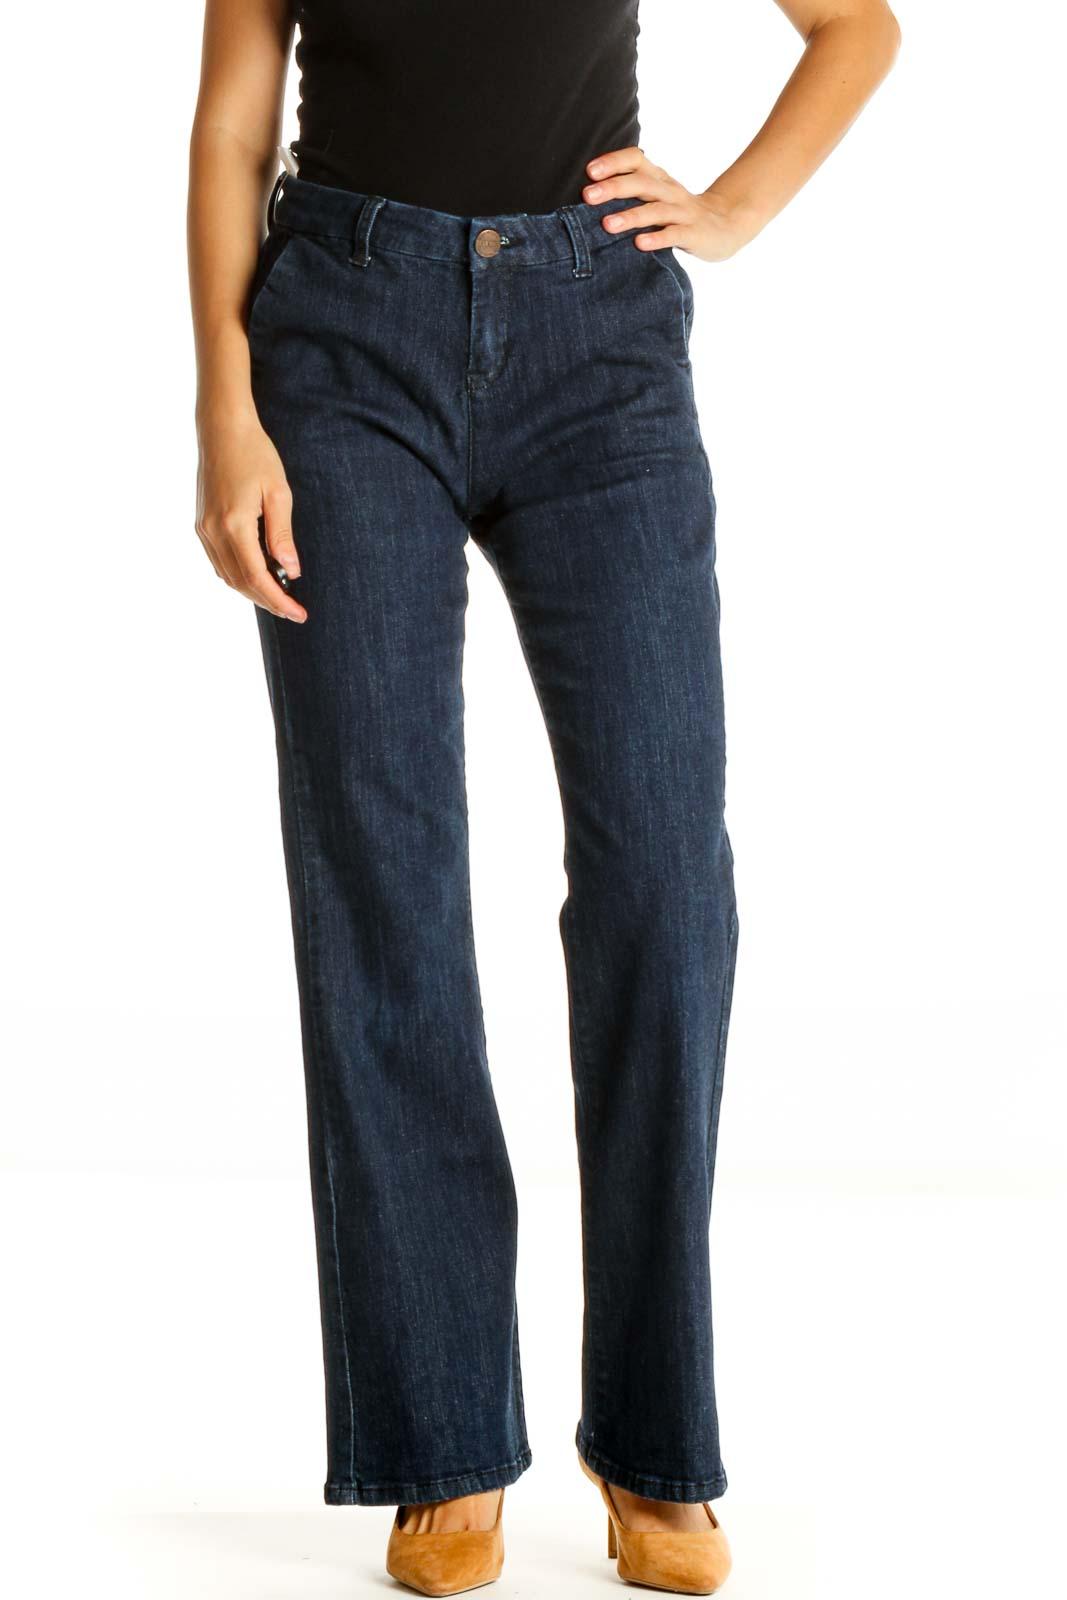 Blue Straight Leg Jeans Front